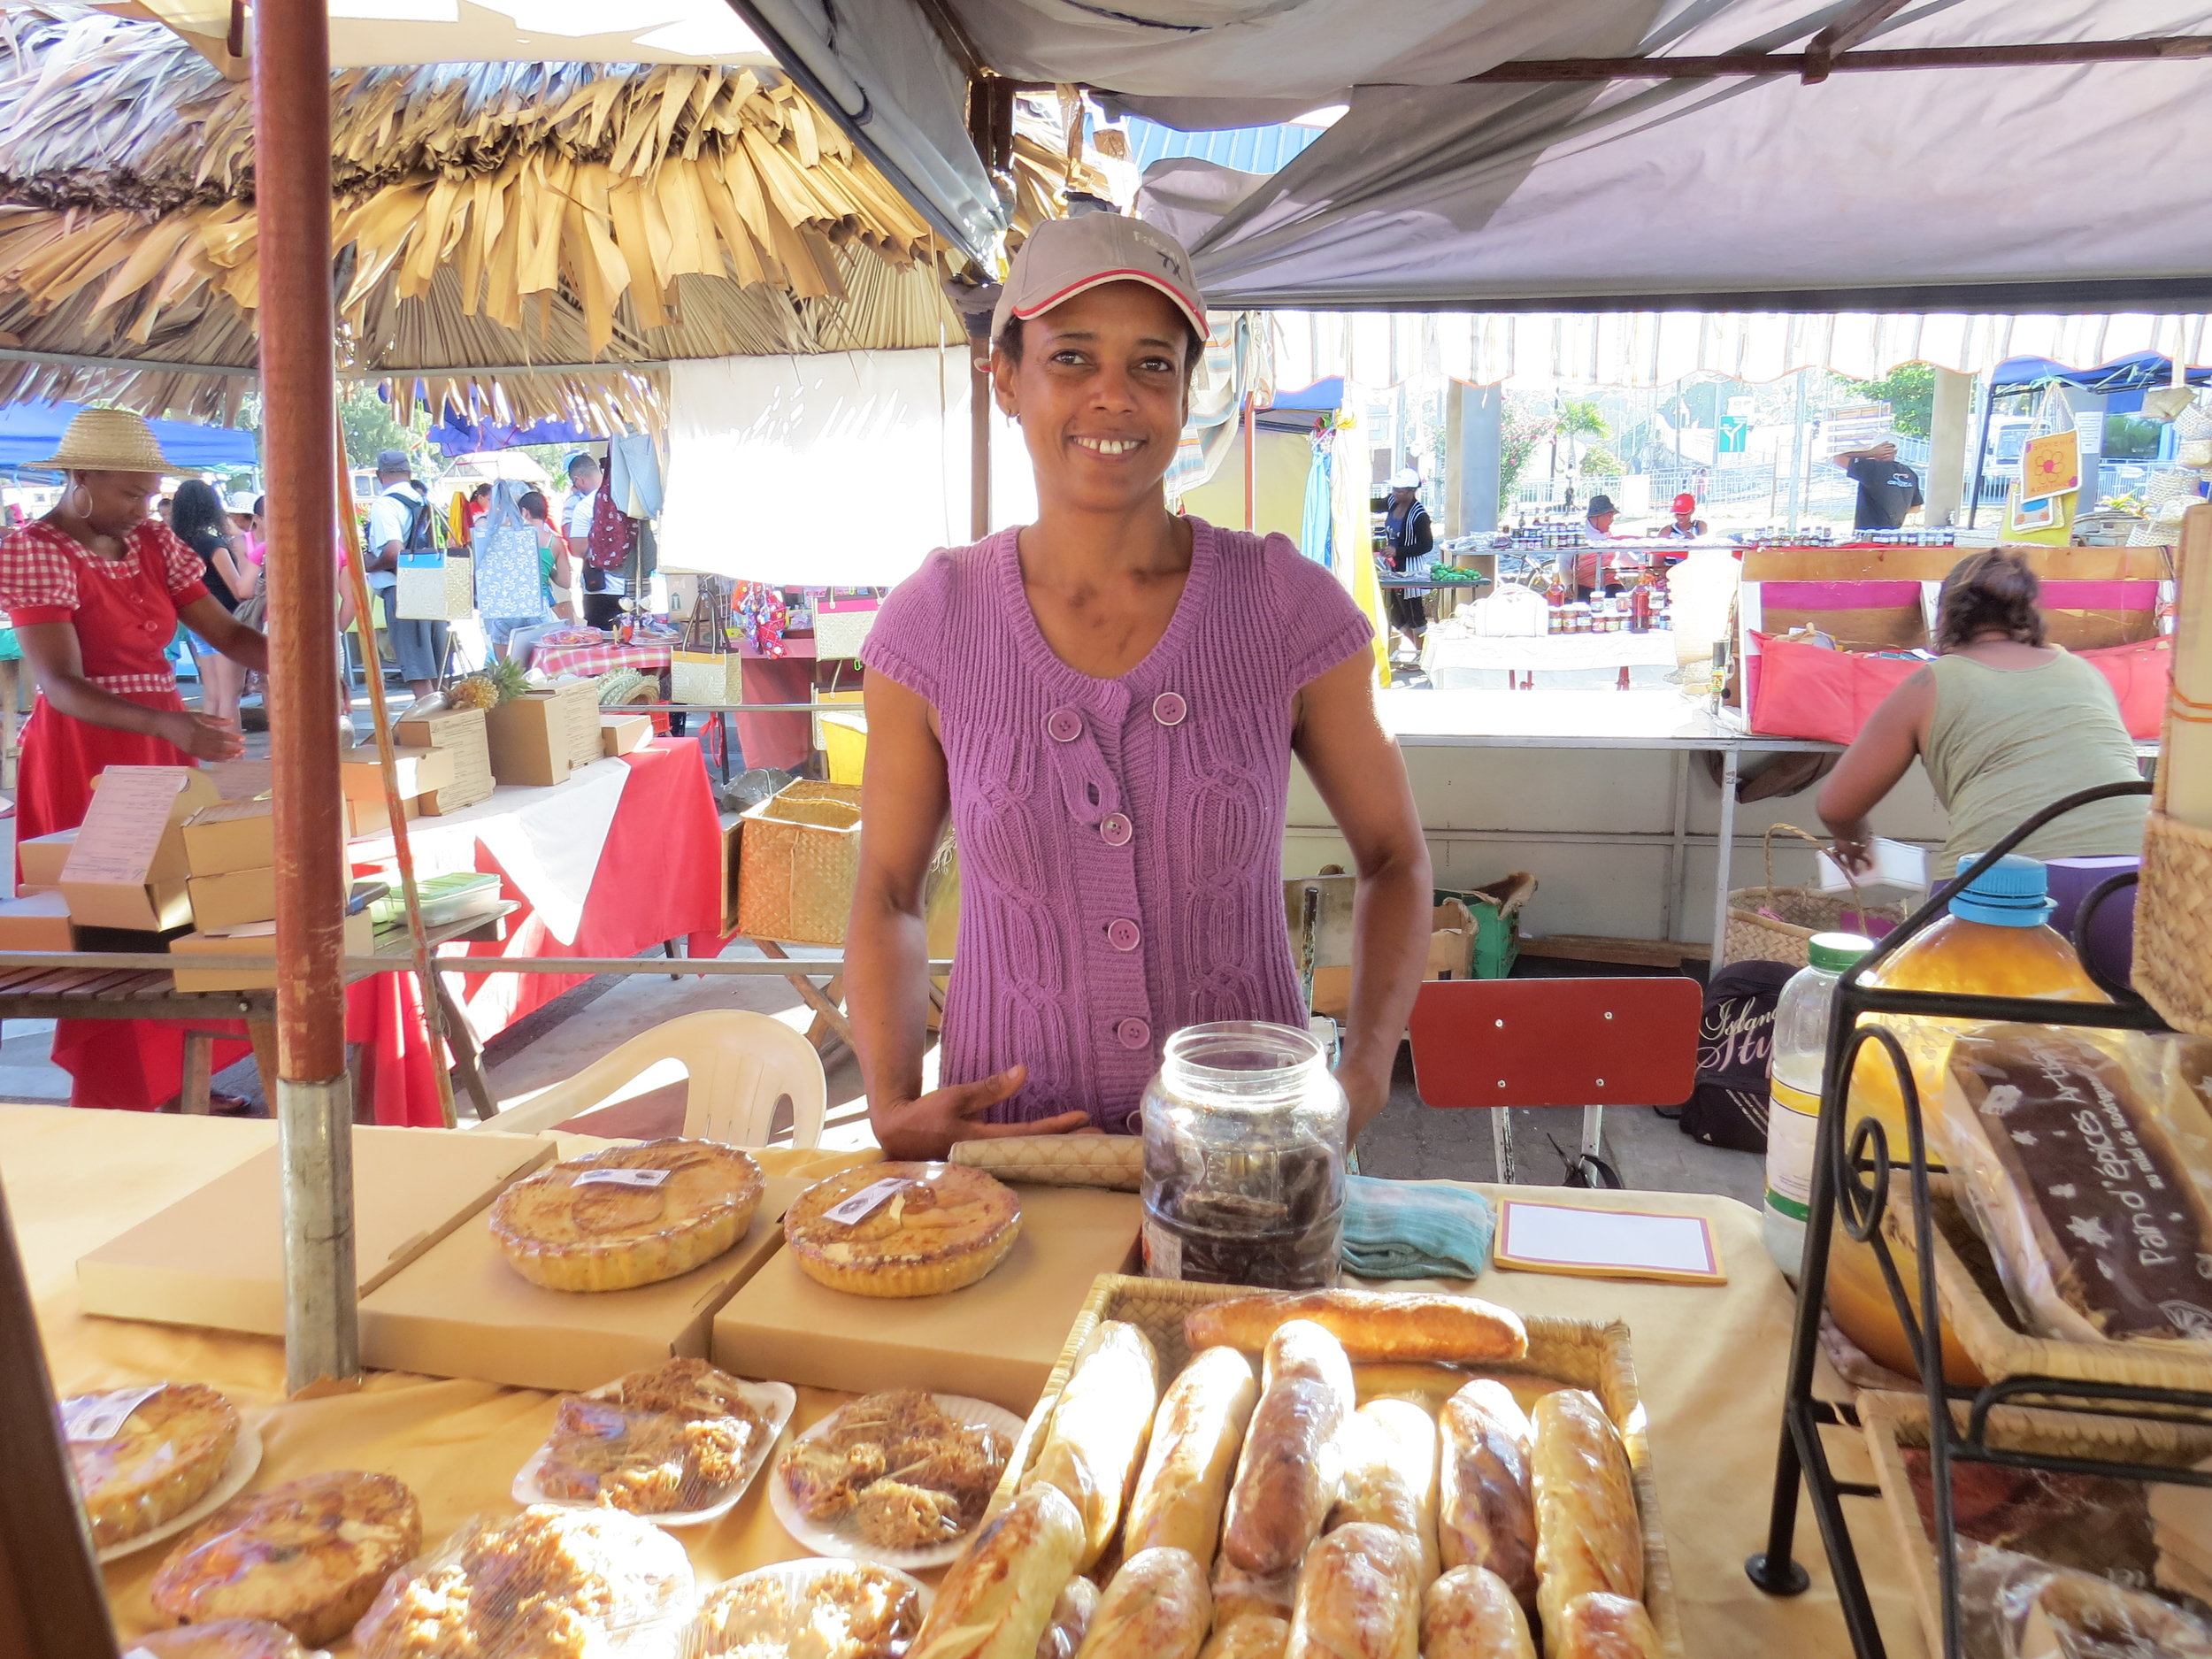 Lively marketplace